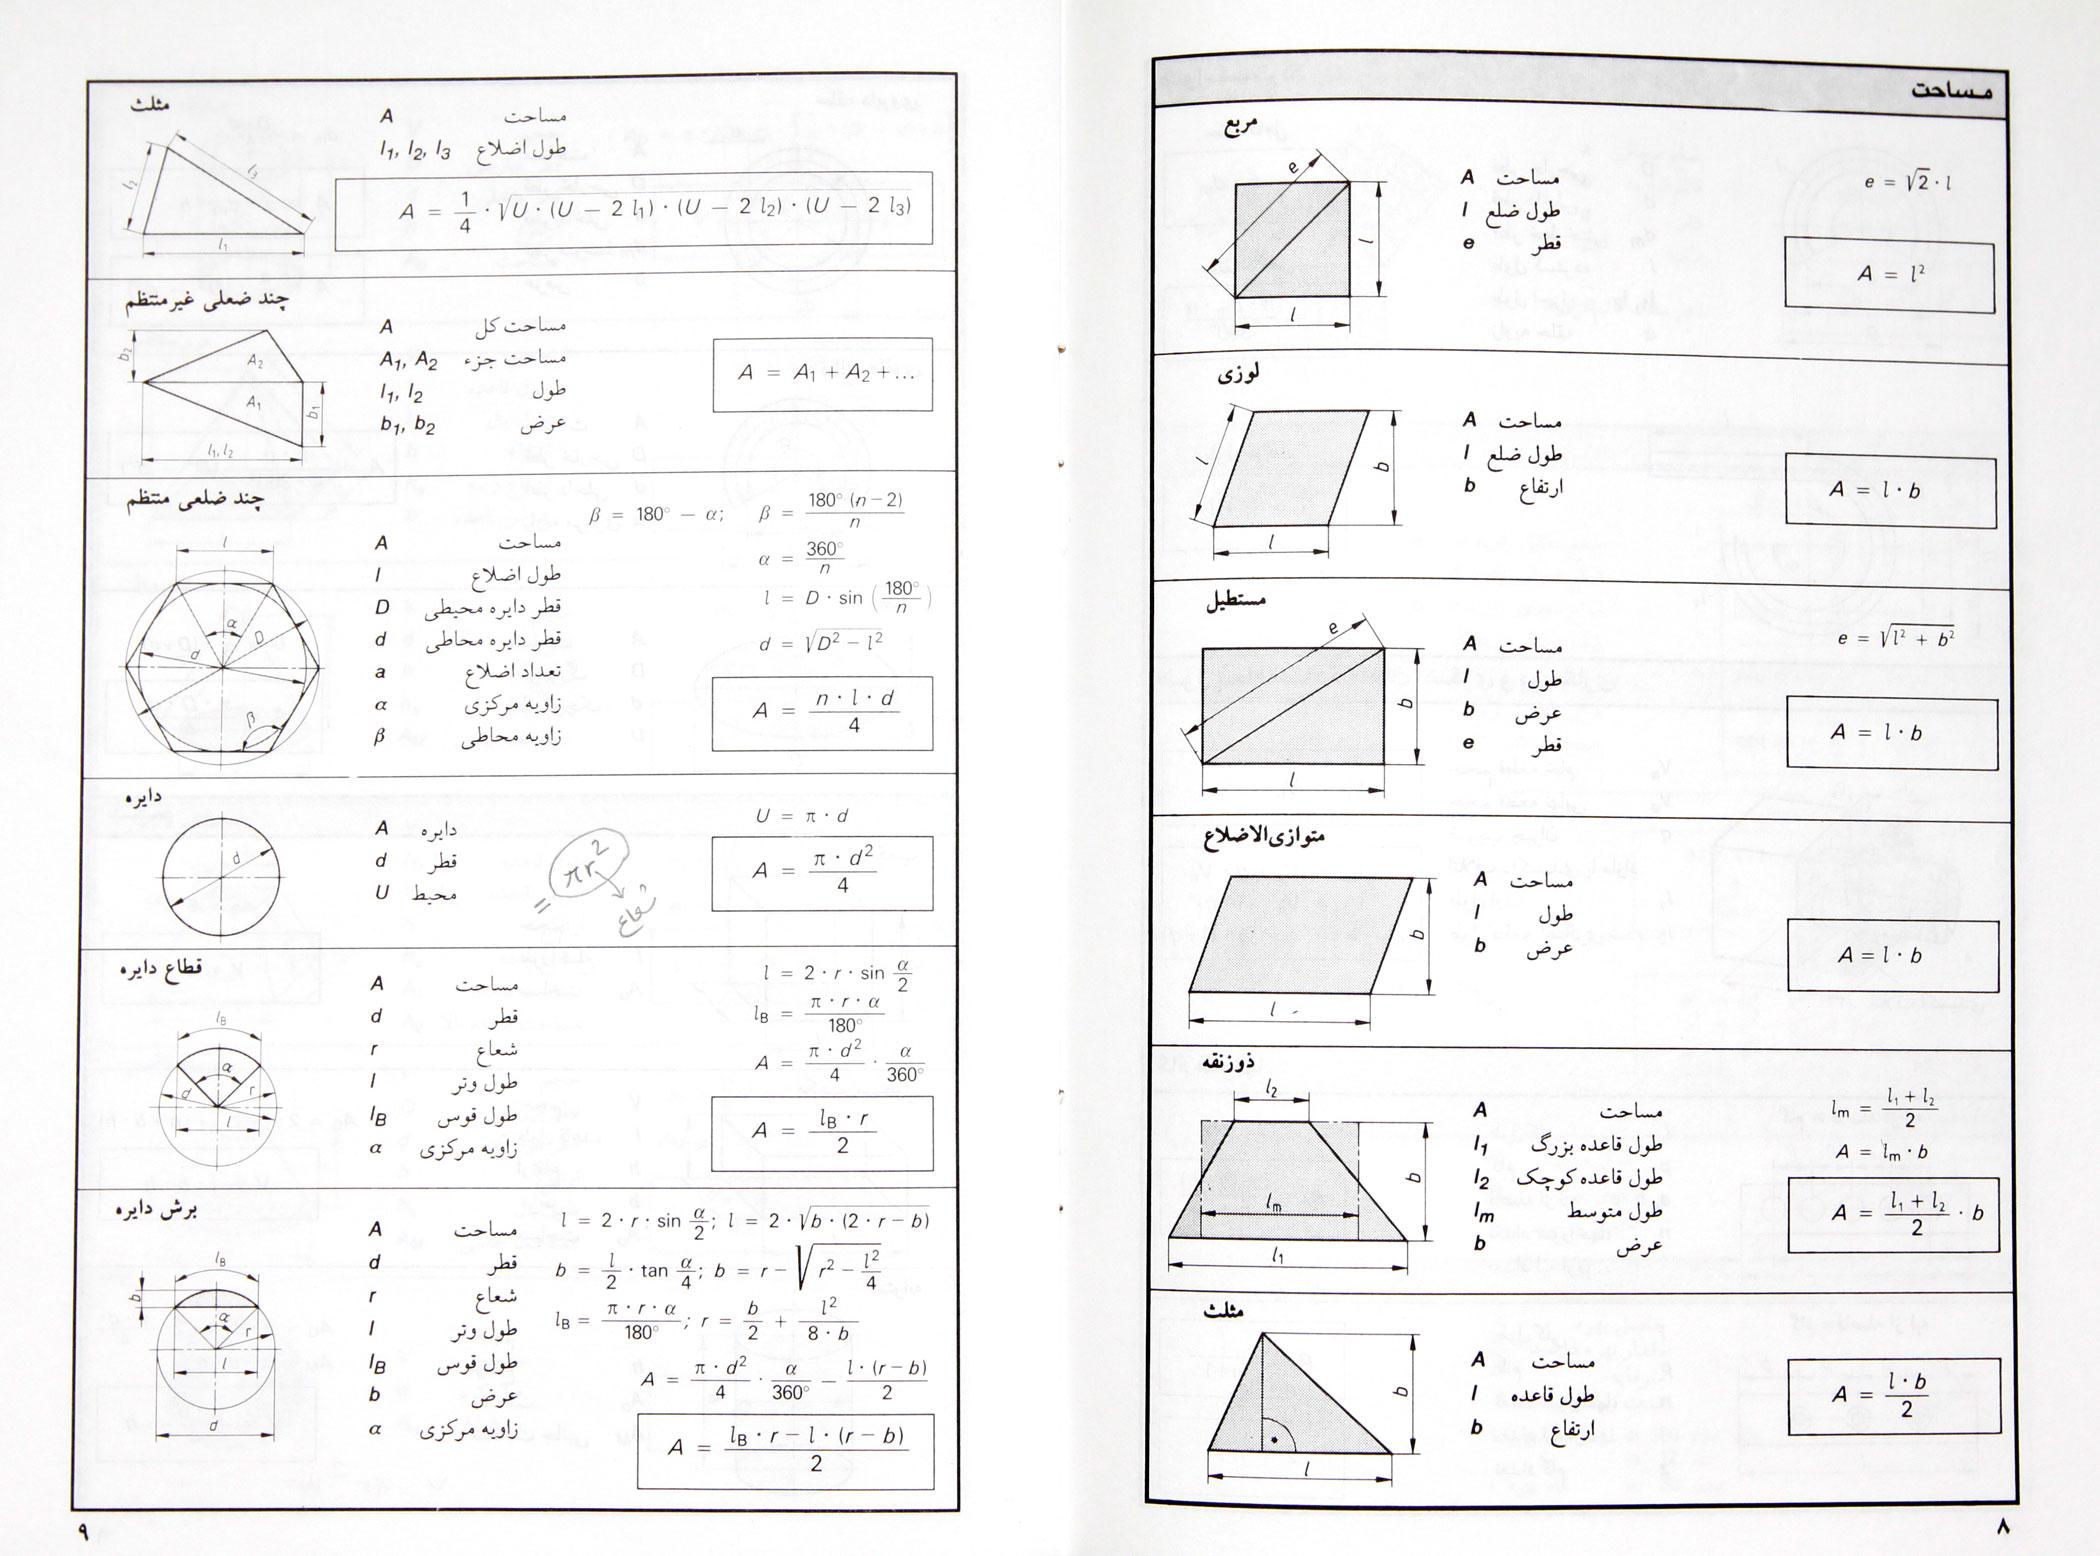 6L 2BQ6L6T5oql5Lu35Y2V5qC85byP also 100 function max2 also Src index together with Index2 together with Index. on index excel